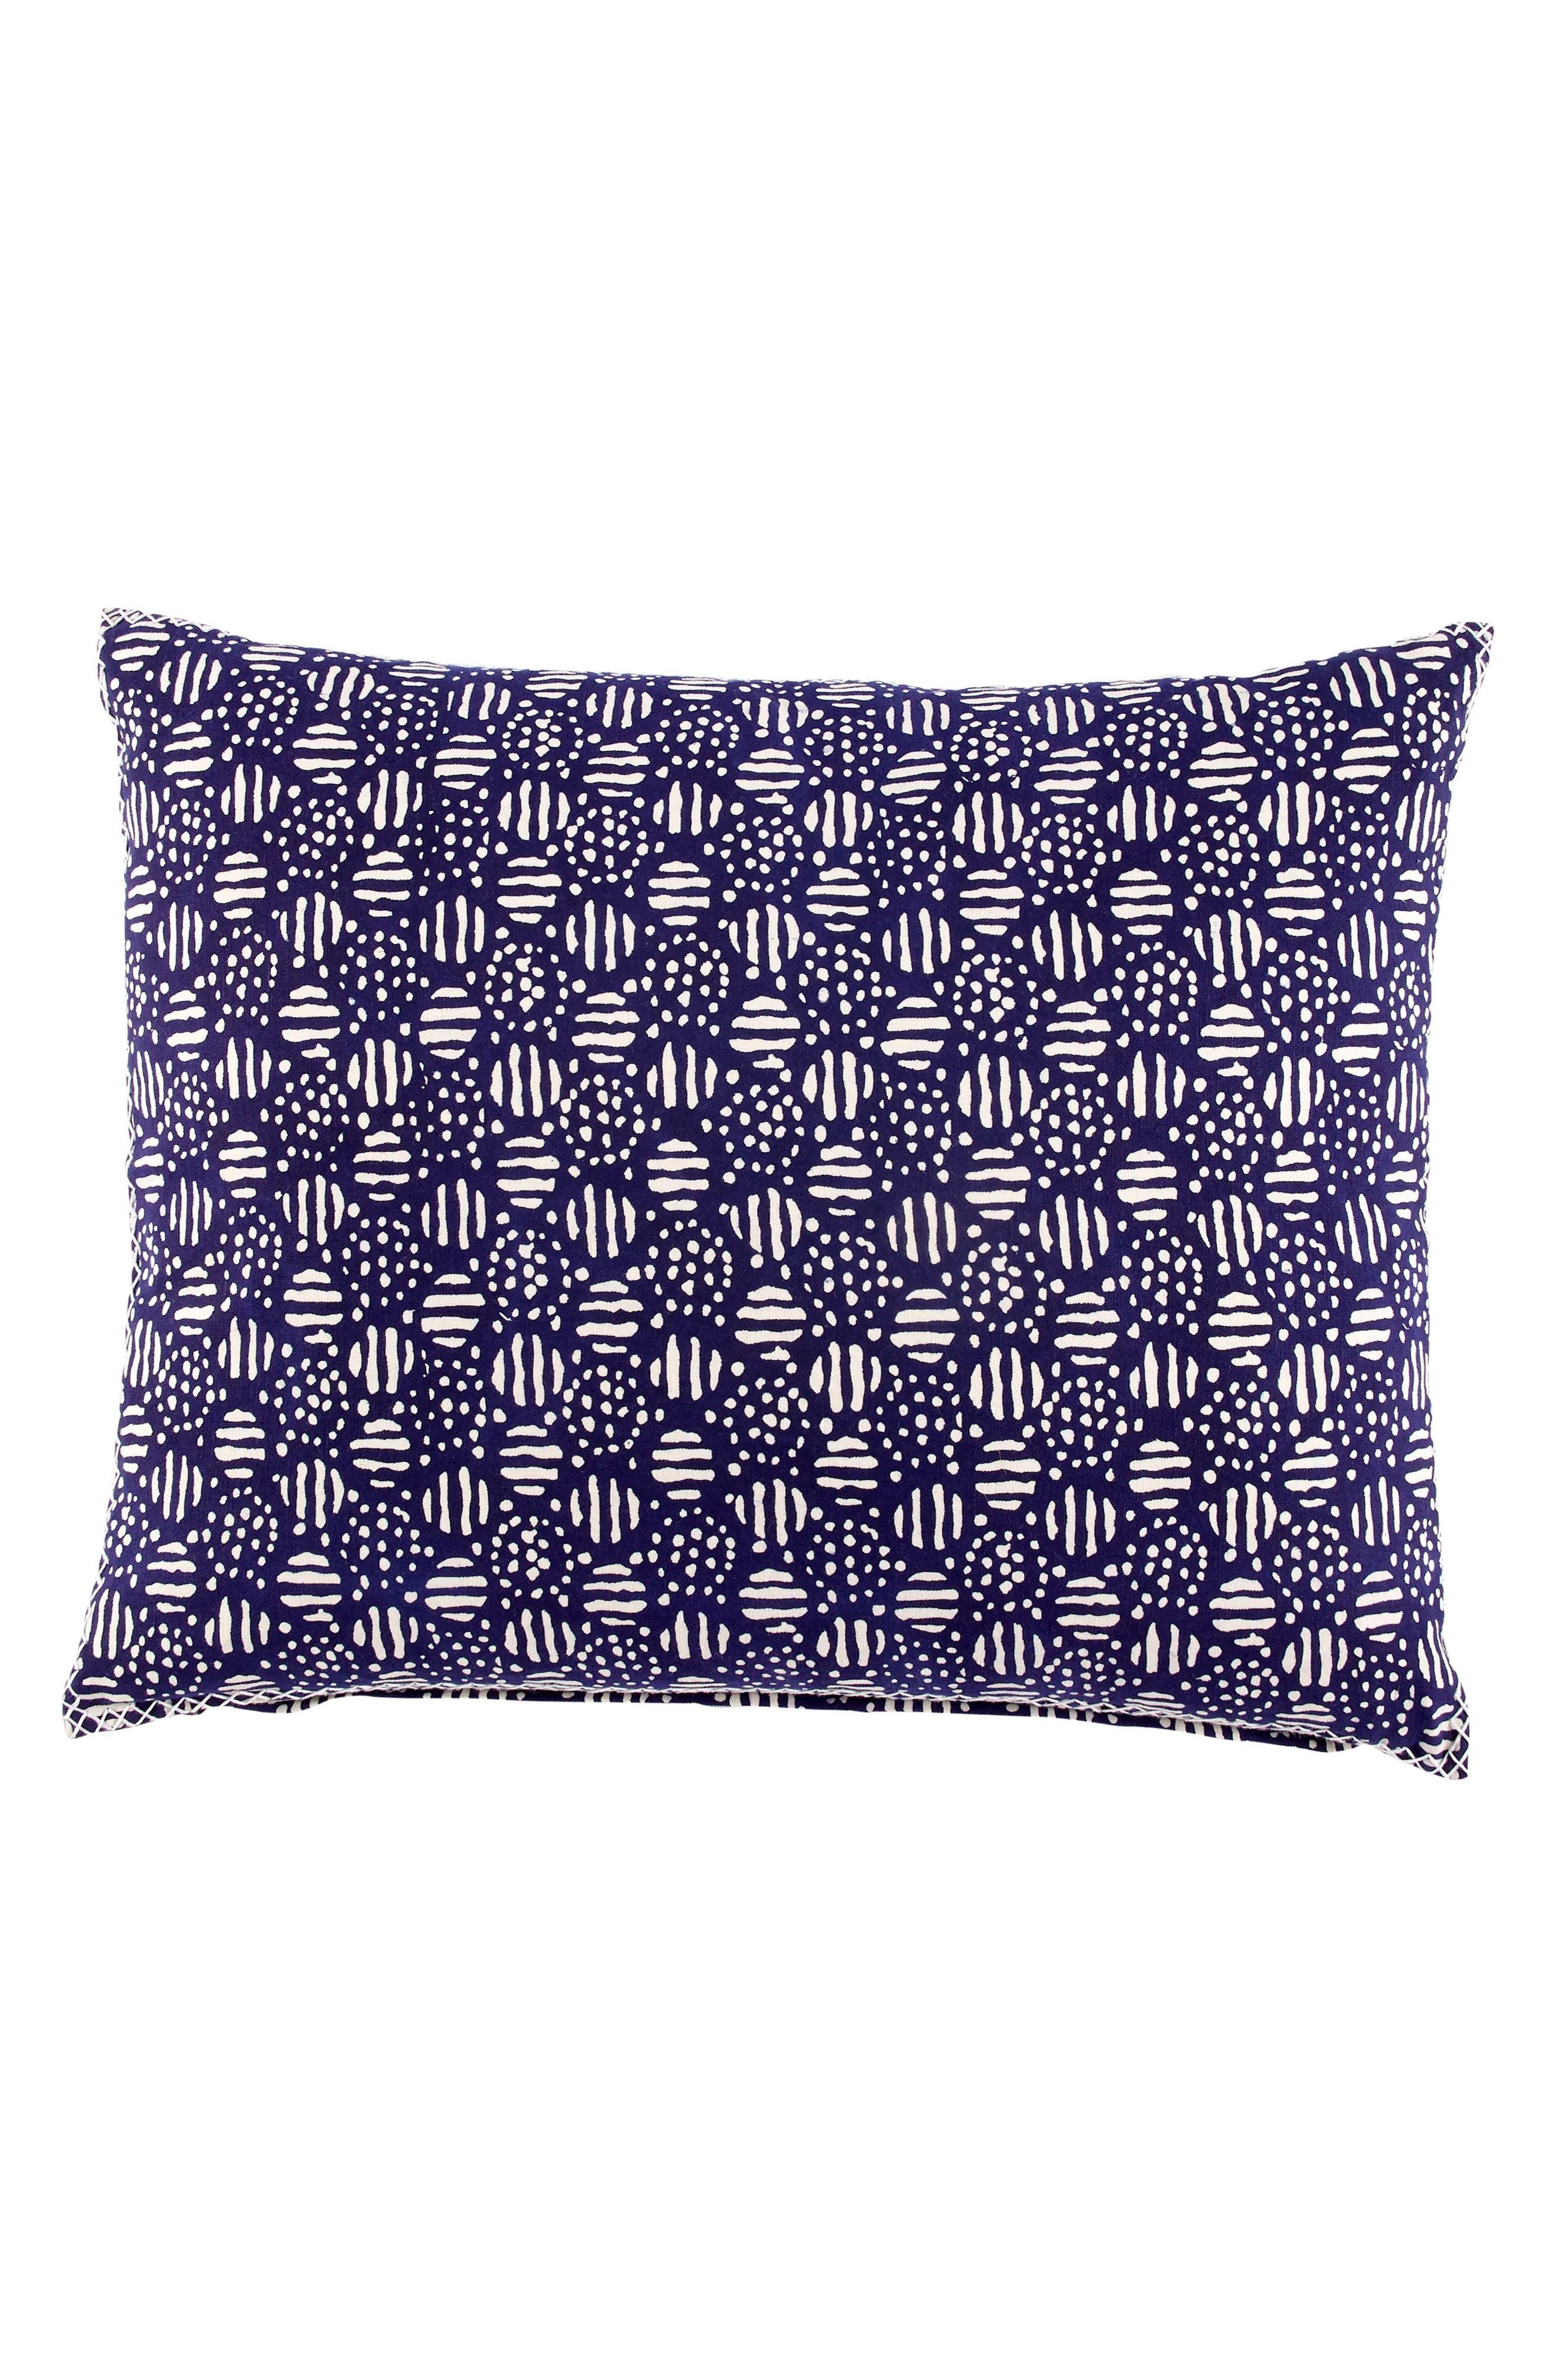 Alternate Image 1 Selected - John Robshaw Kimikosa Bolster Accent Pillow